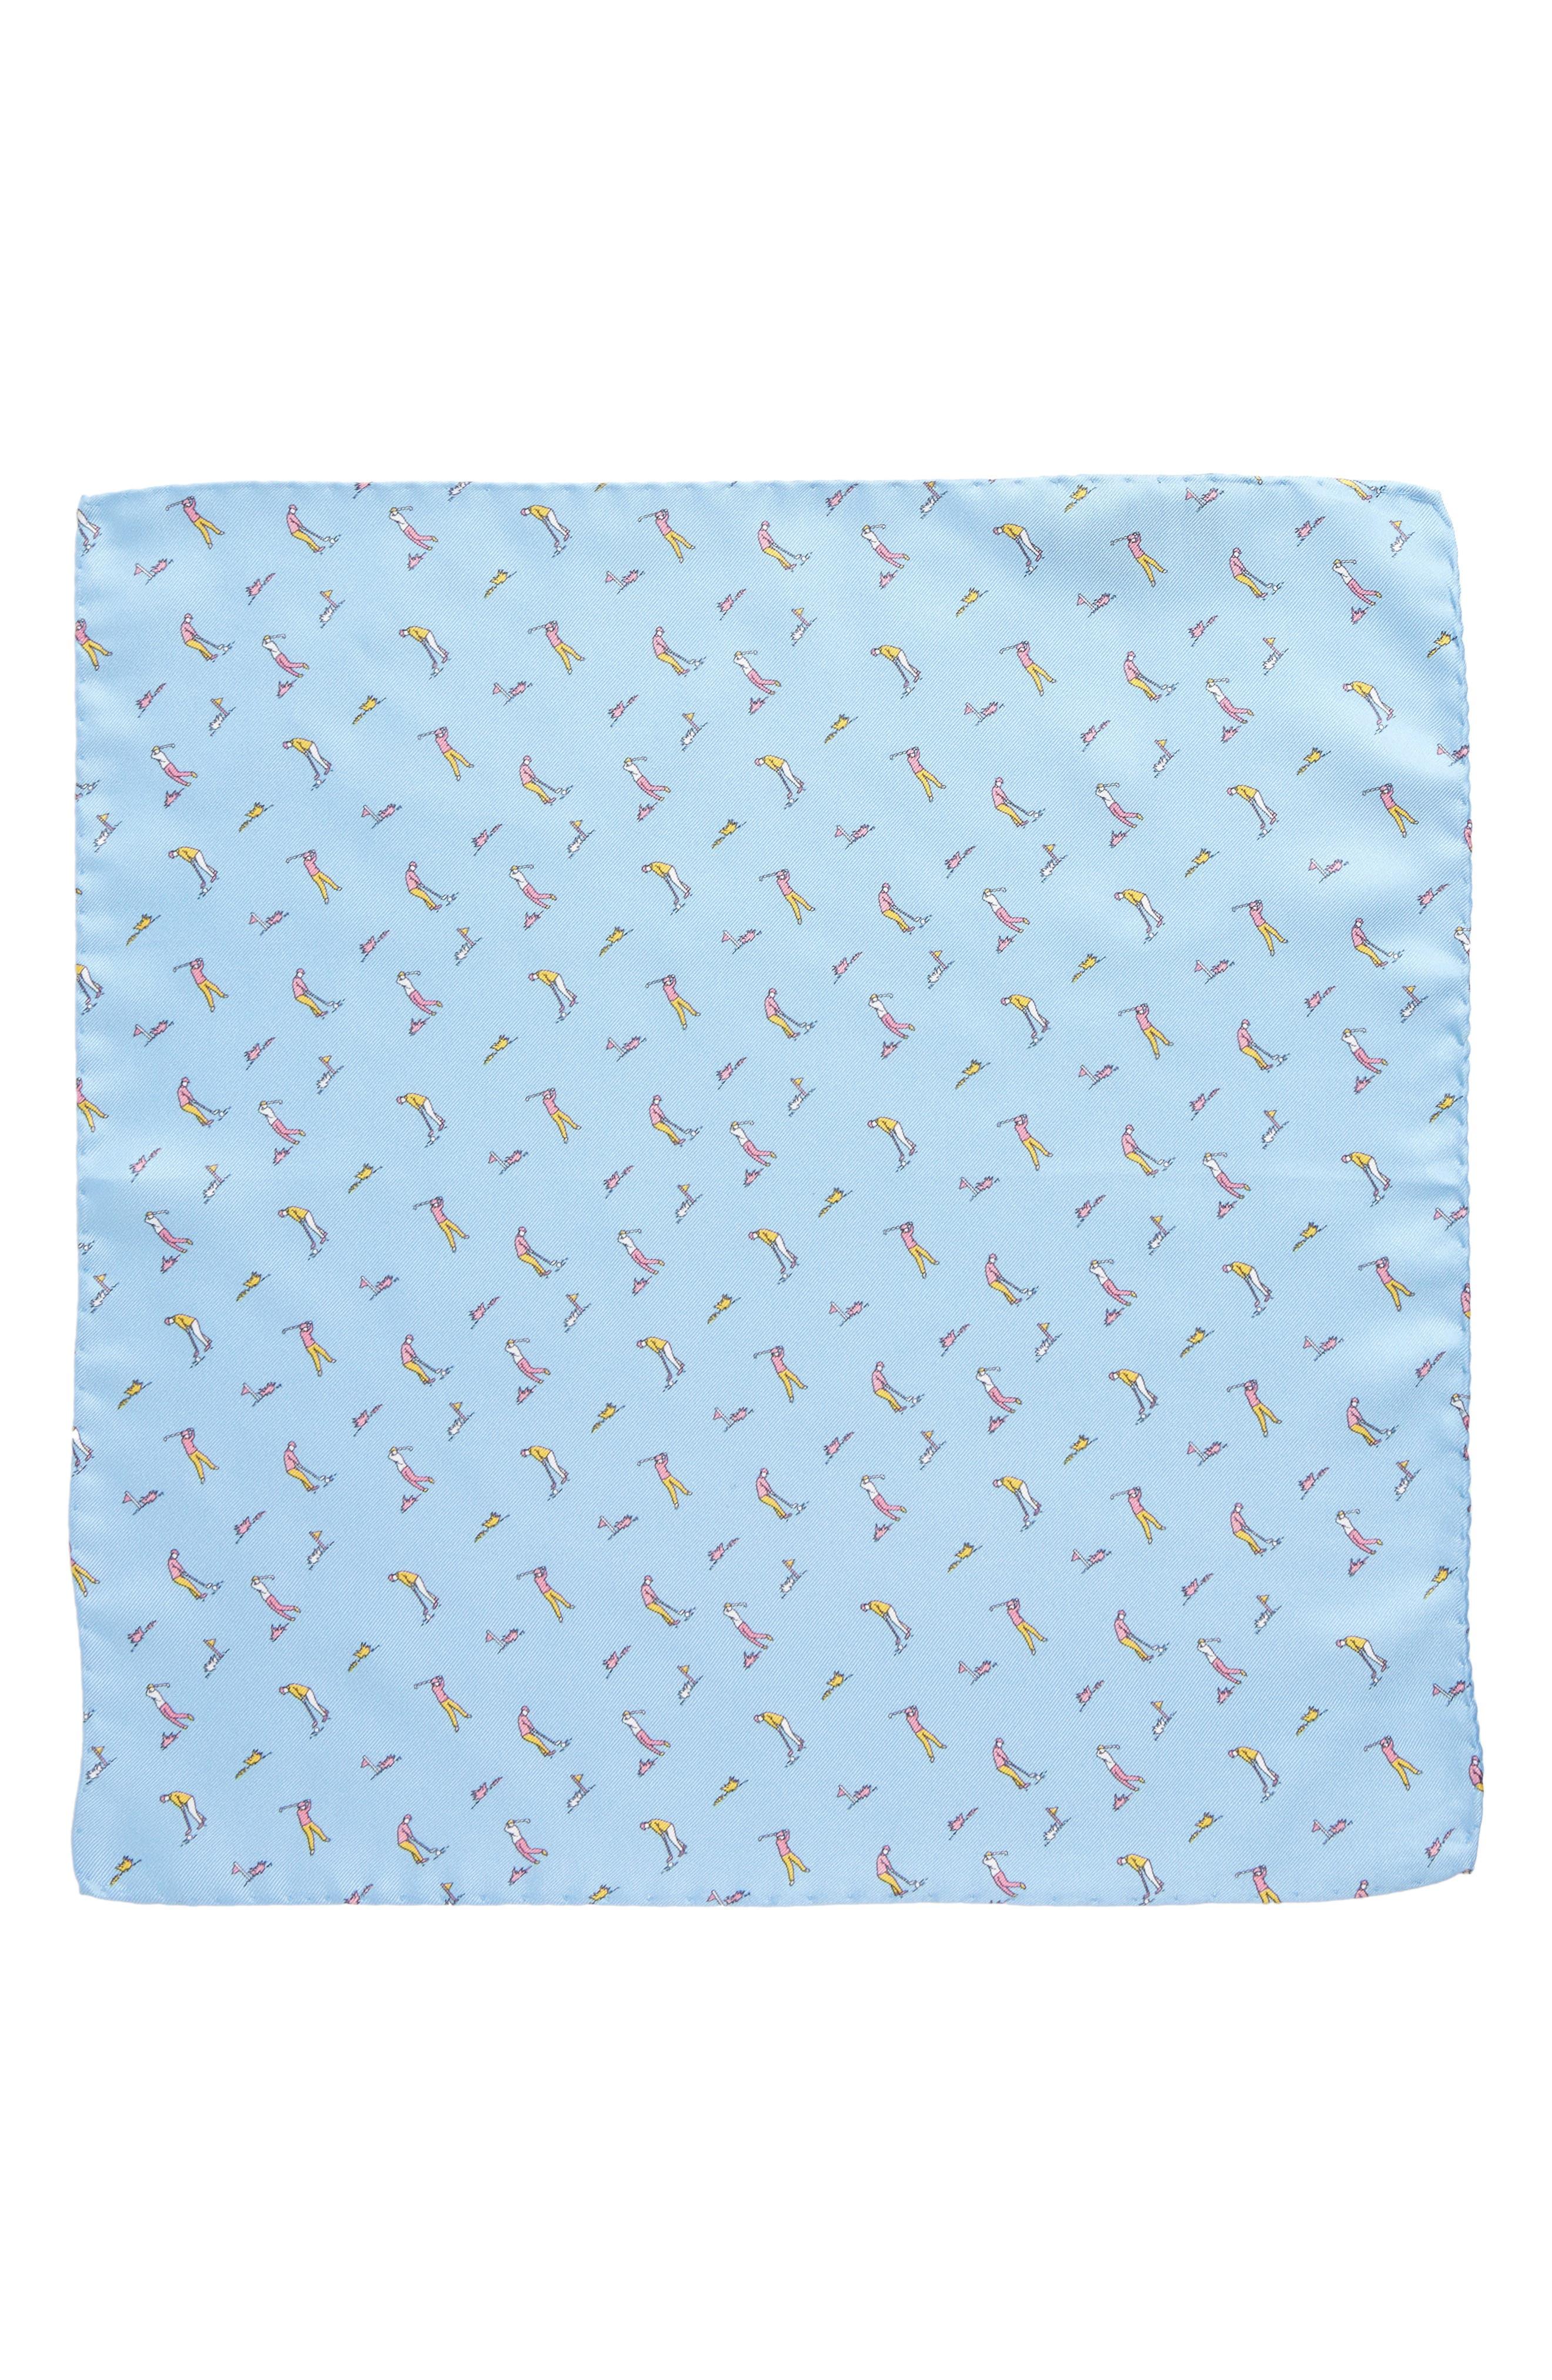 Foreplay Silk Pocket Square,                             Alternate thumbnail 3, color,                             Light Blue